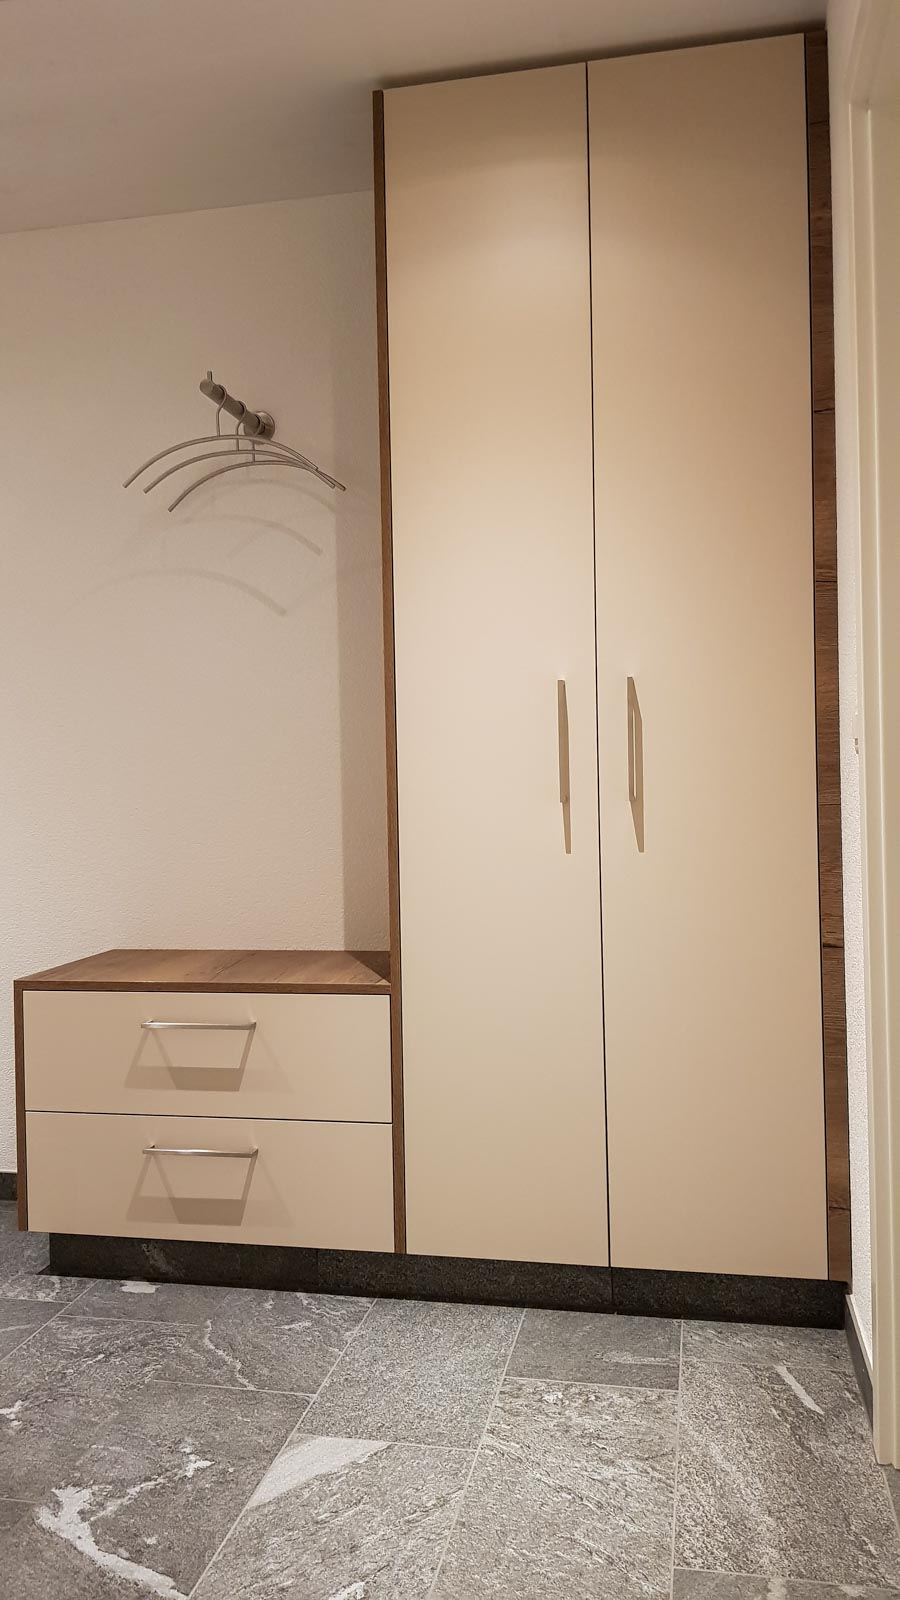 Wooddesign_Garderobe_Gästegarderobe_Holzdecor_weiss_offene Gästegarderobe (3)